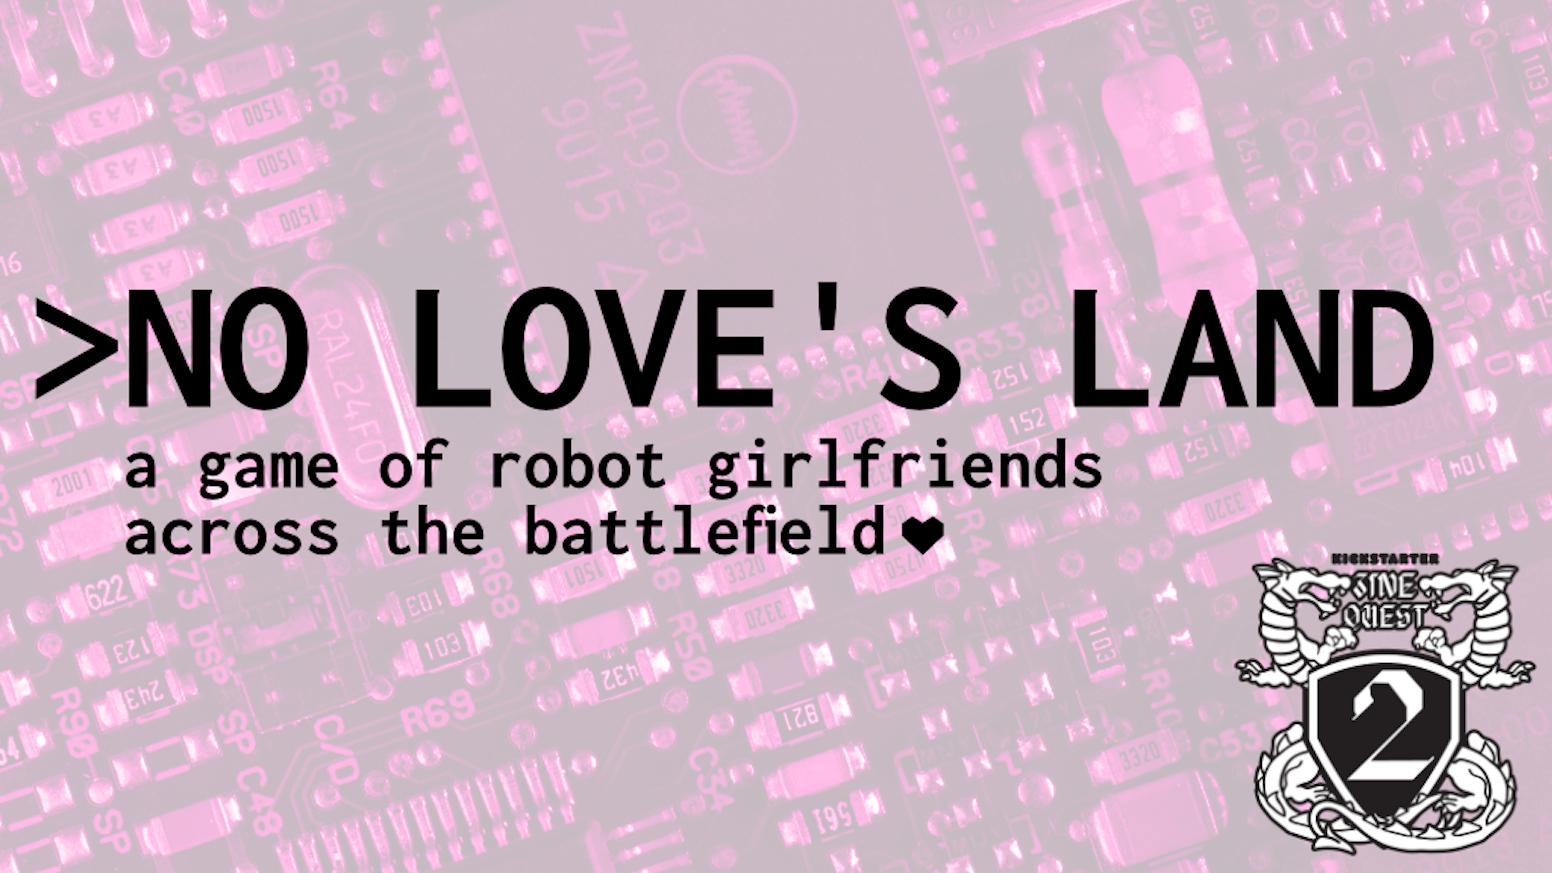 LARP for 2 players of Robot Girlfriends across the battlefield